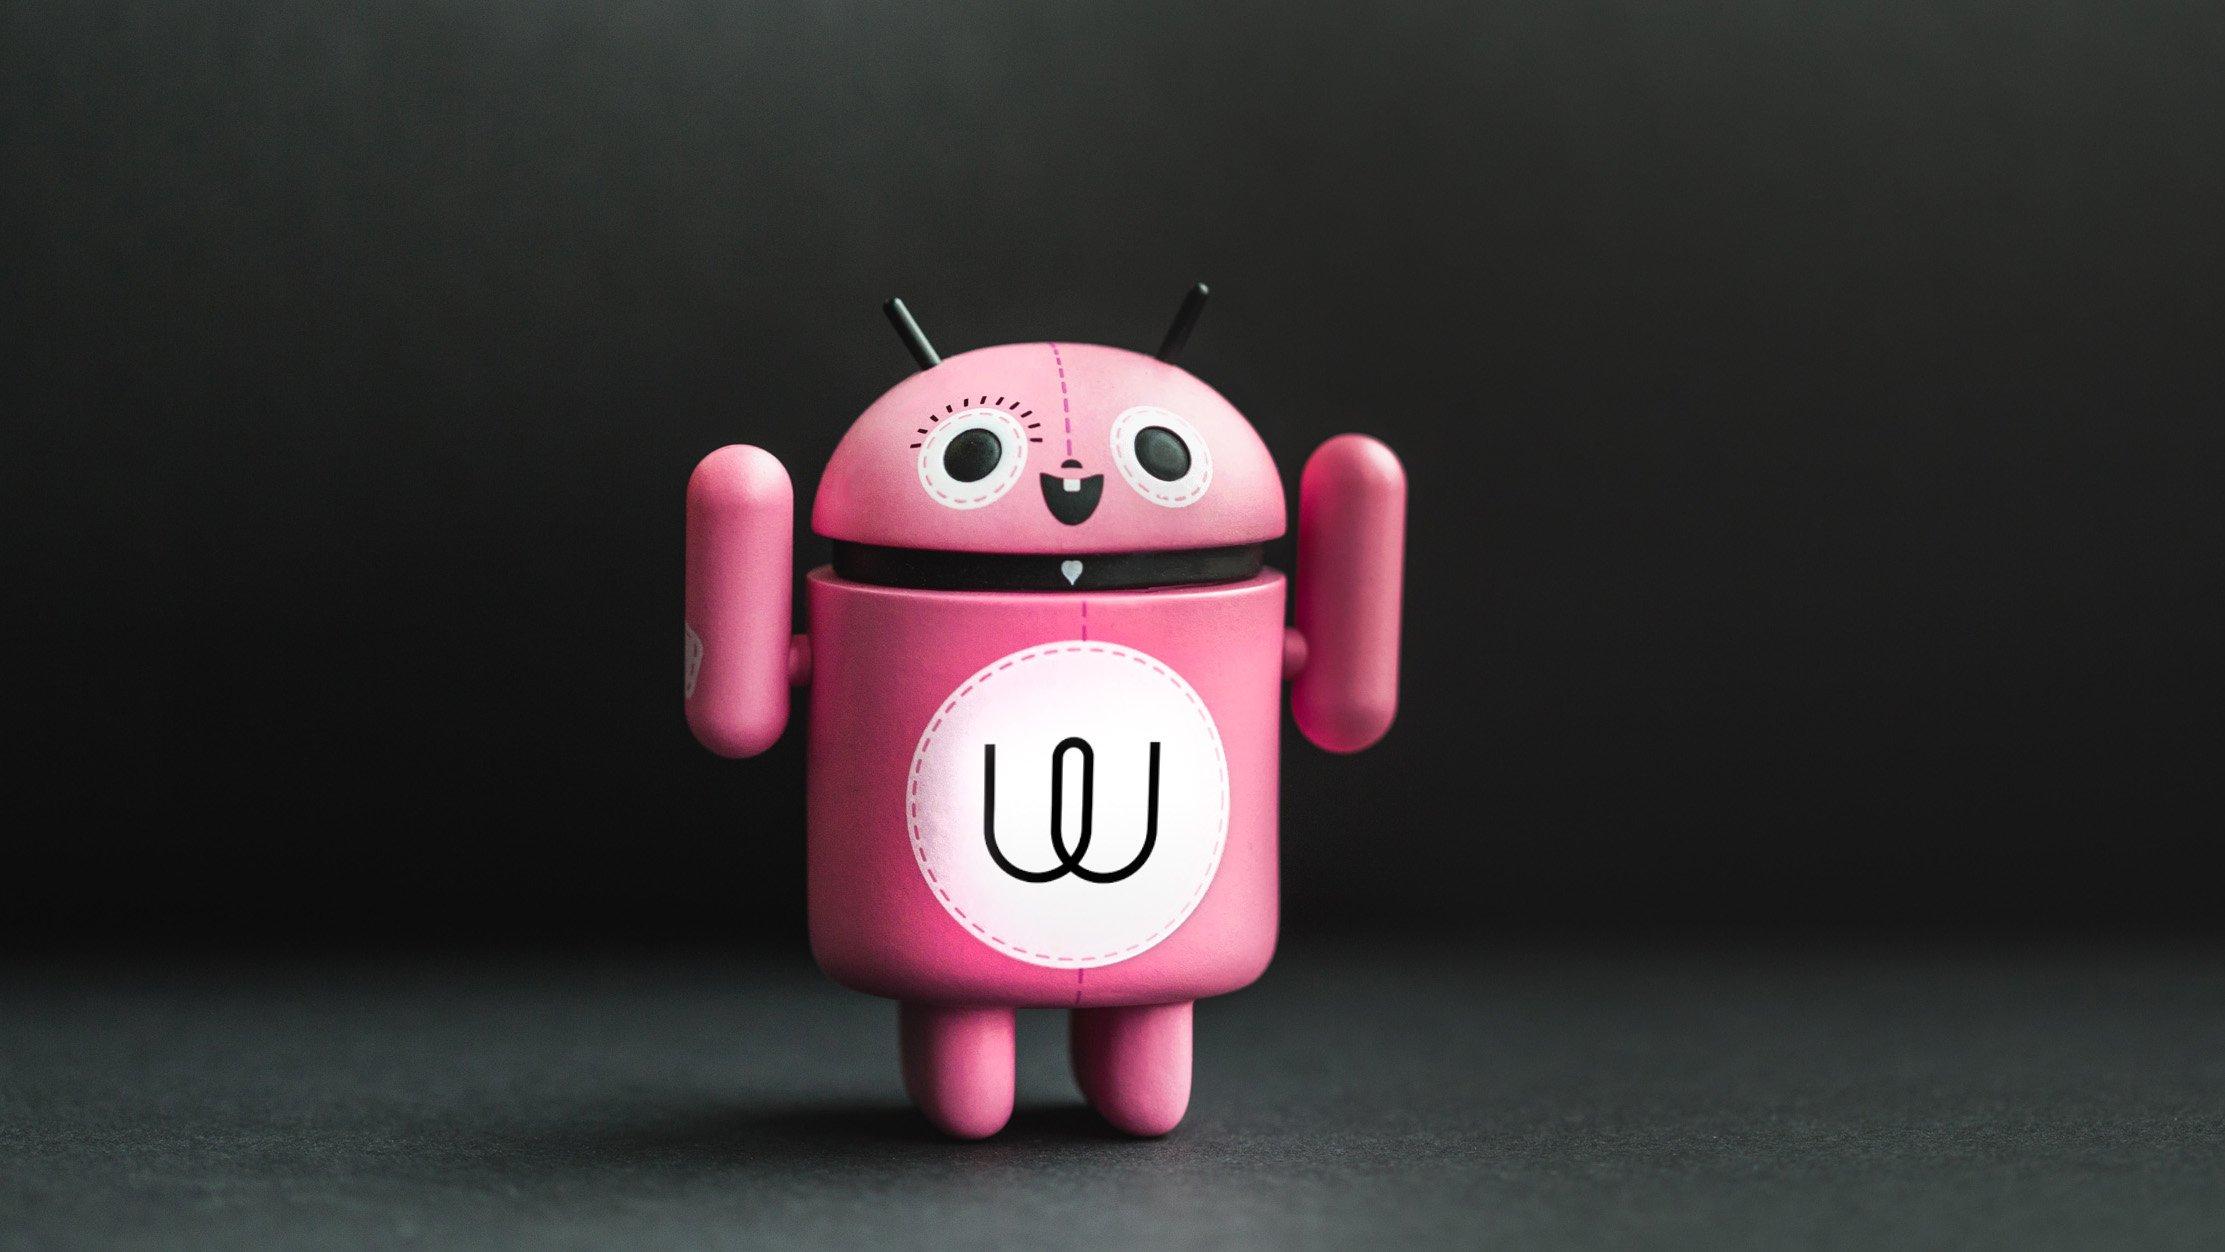 installer l'application Play Store CyanogenMod 13